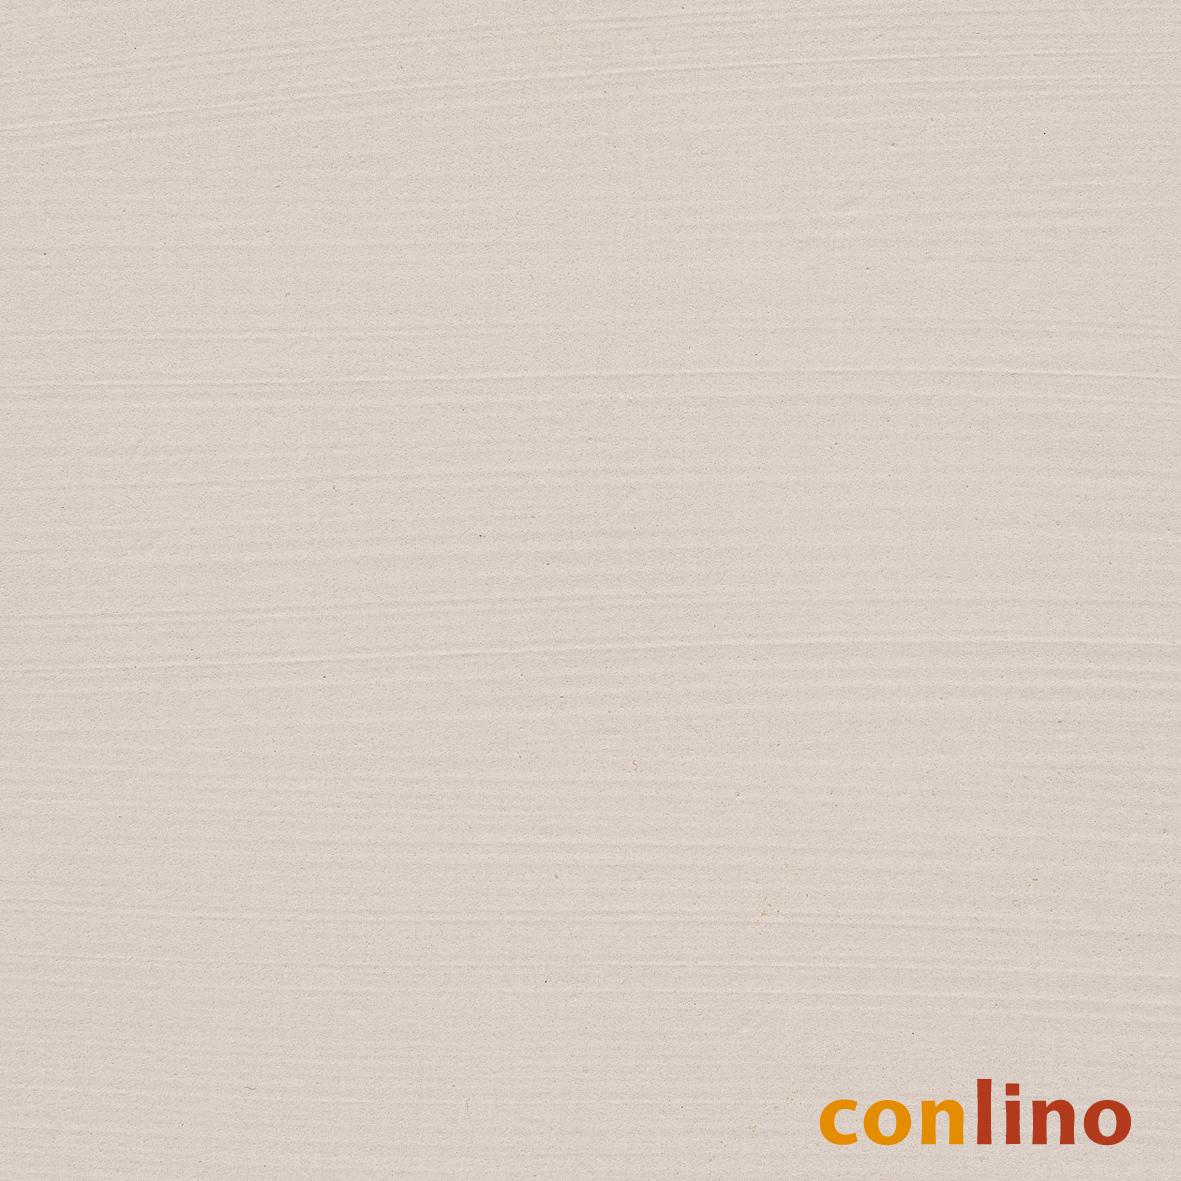 conlino Lehmfarbe Bilbao CL 105